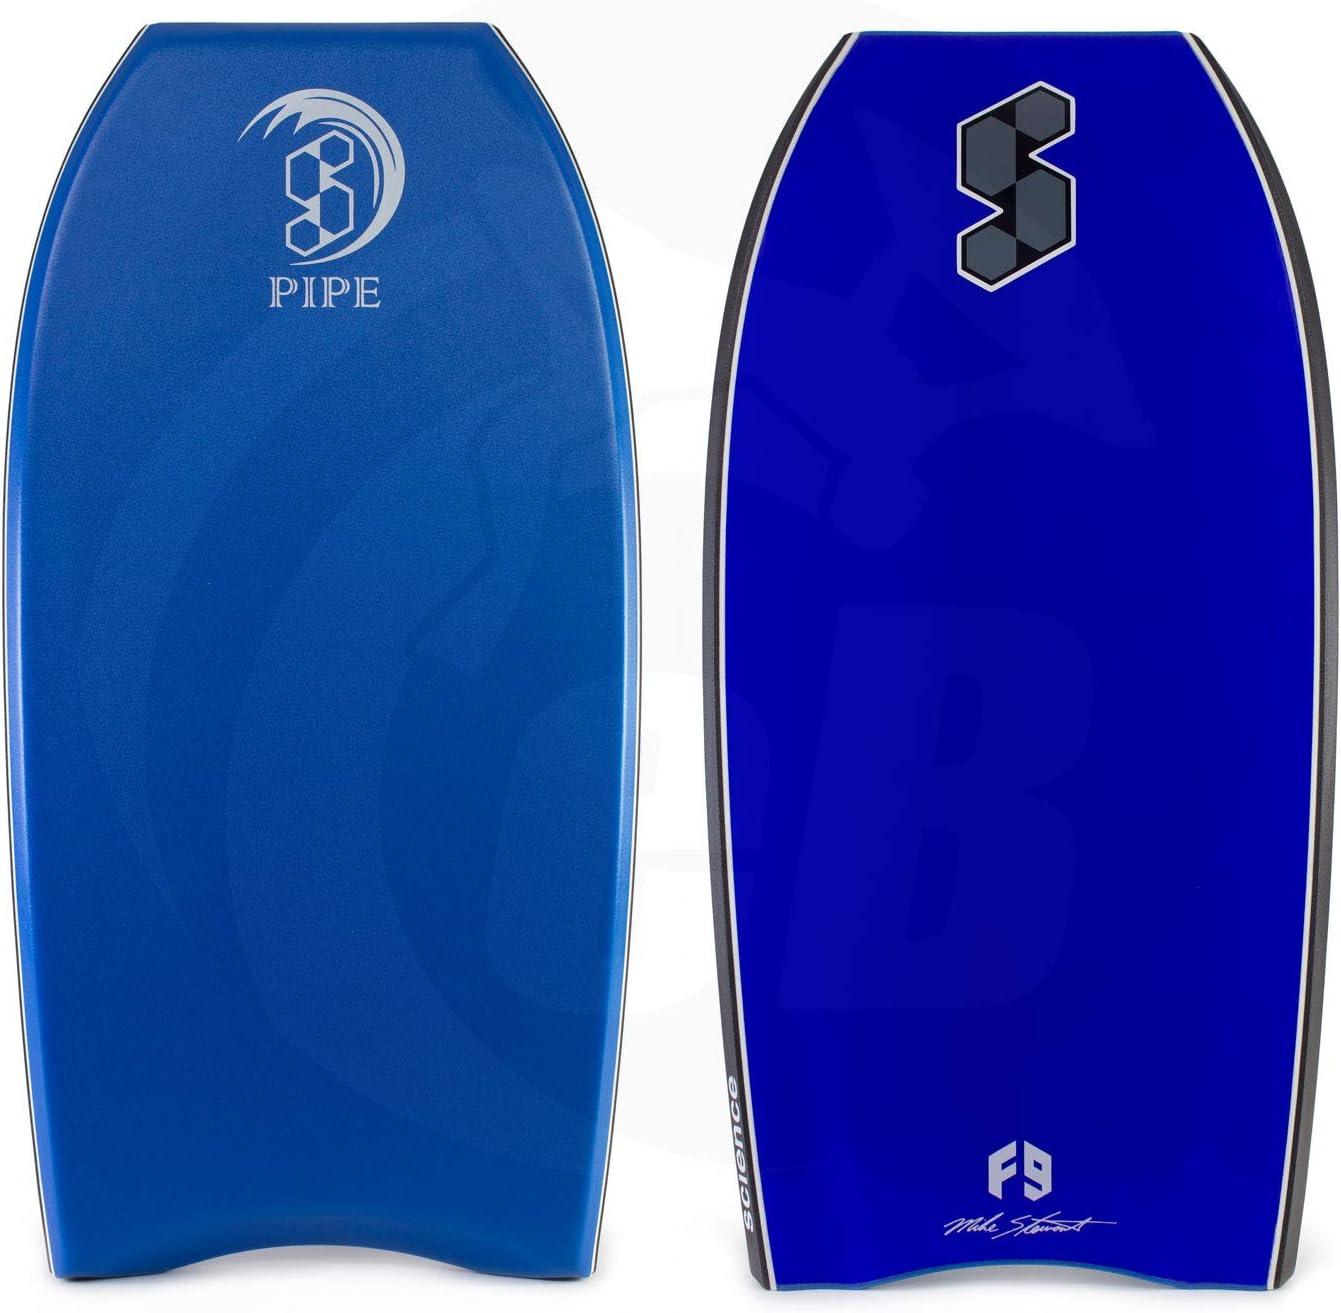 Mike Stewart Science Bodyboard Pipe Intermediate Polyethylene Crescent Tail 1 Stringer